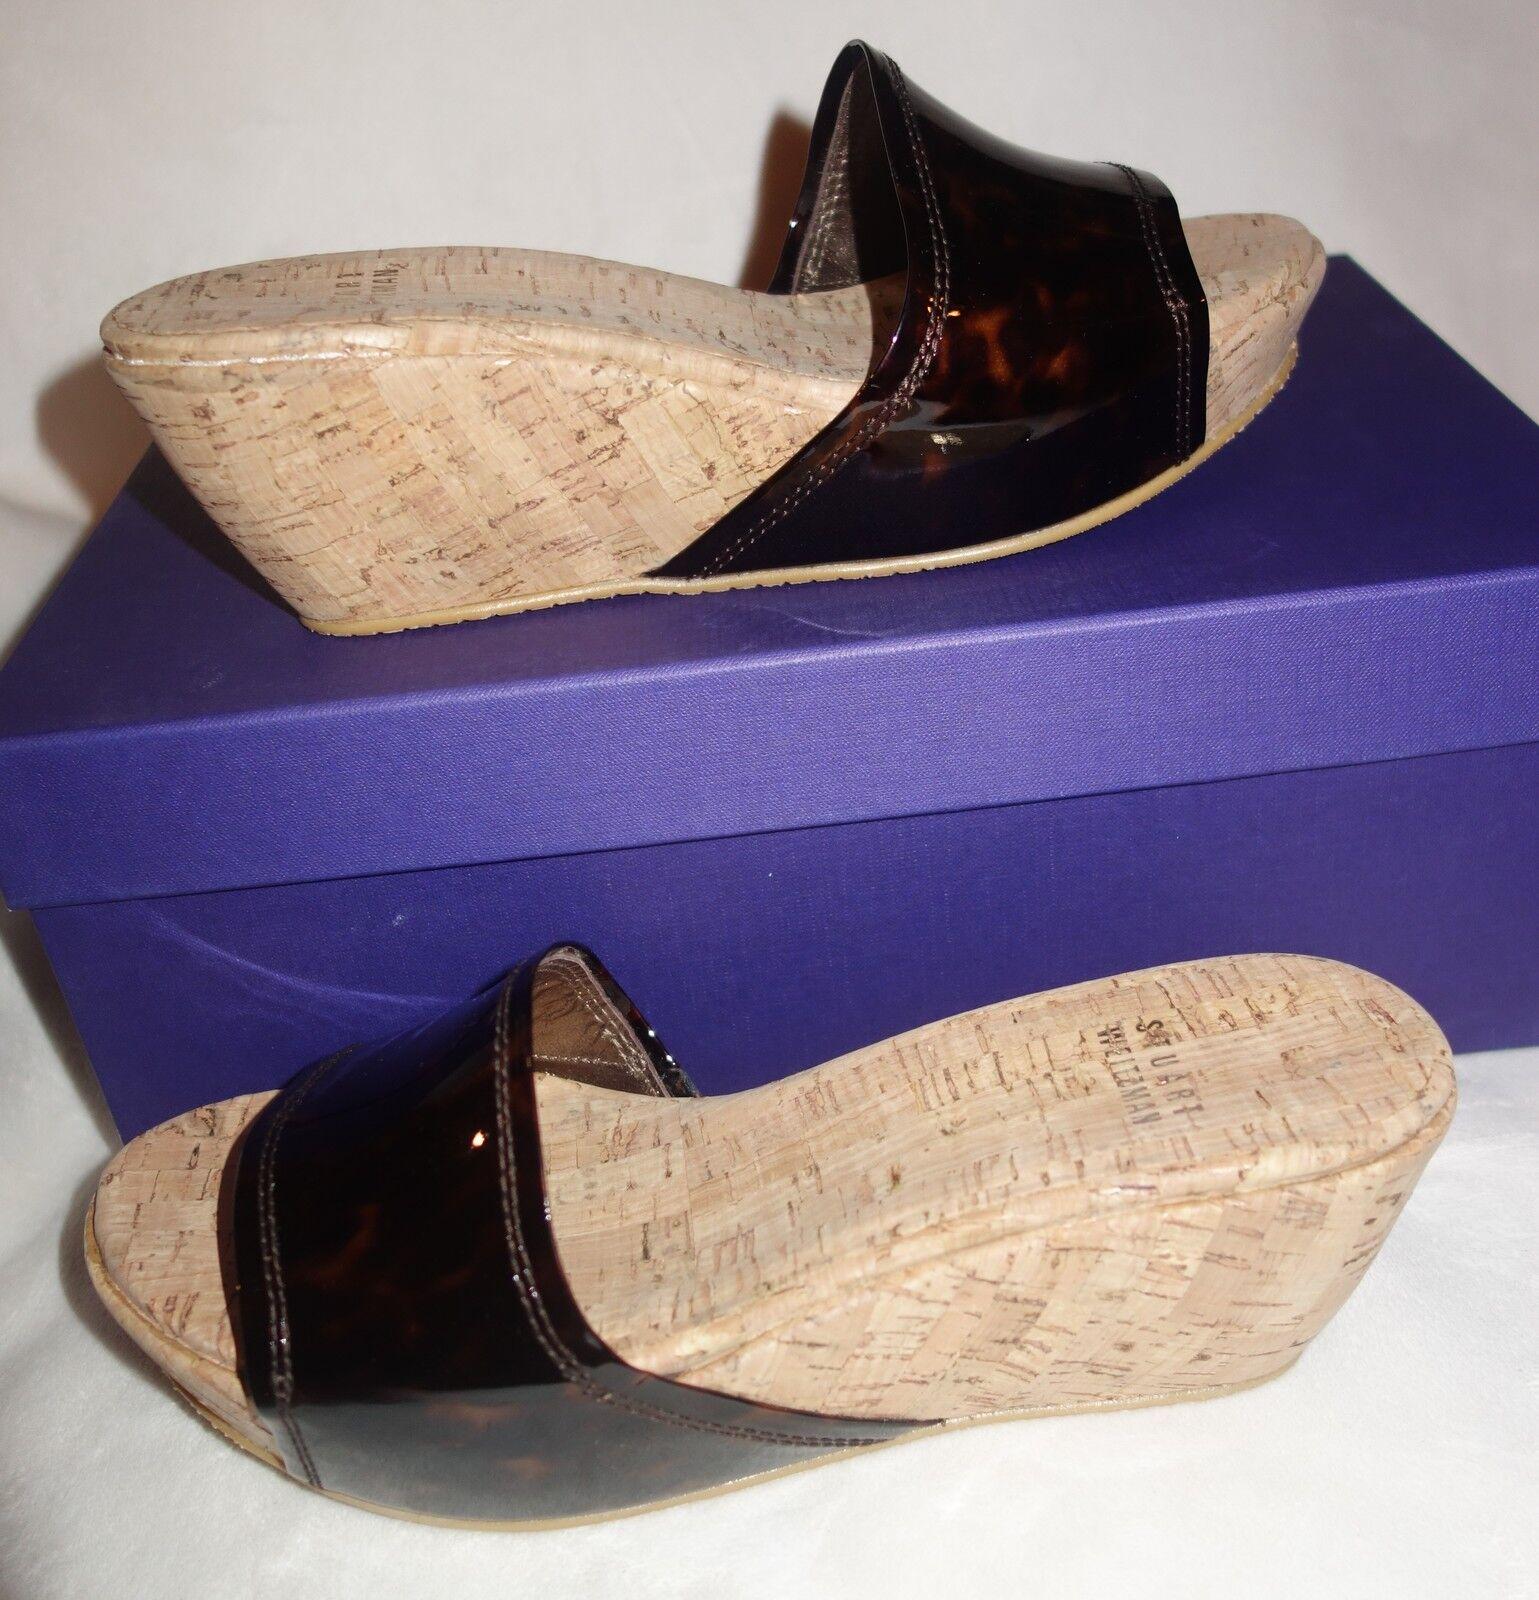 prendi l'ultimo Stuart Weitzman Kimono wedge wedge wedge scarpe Cognac Tartaruga  sz 37 US SZ 6.5 new  marchio famoso